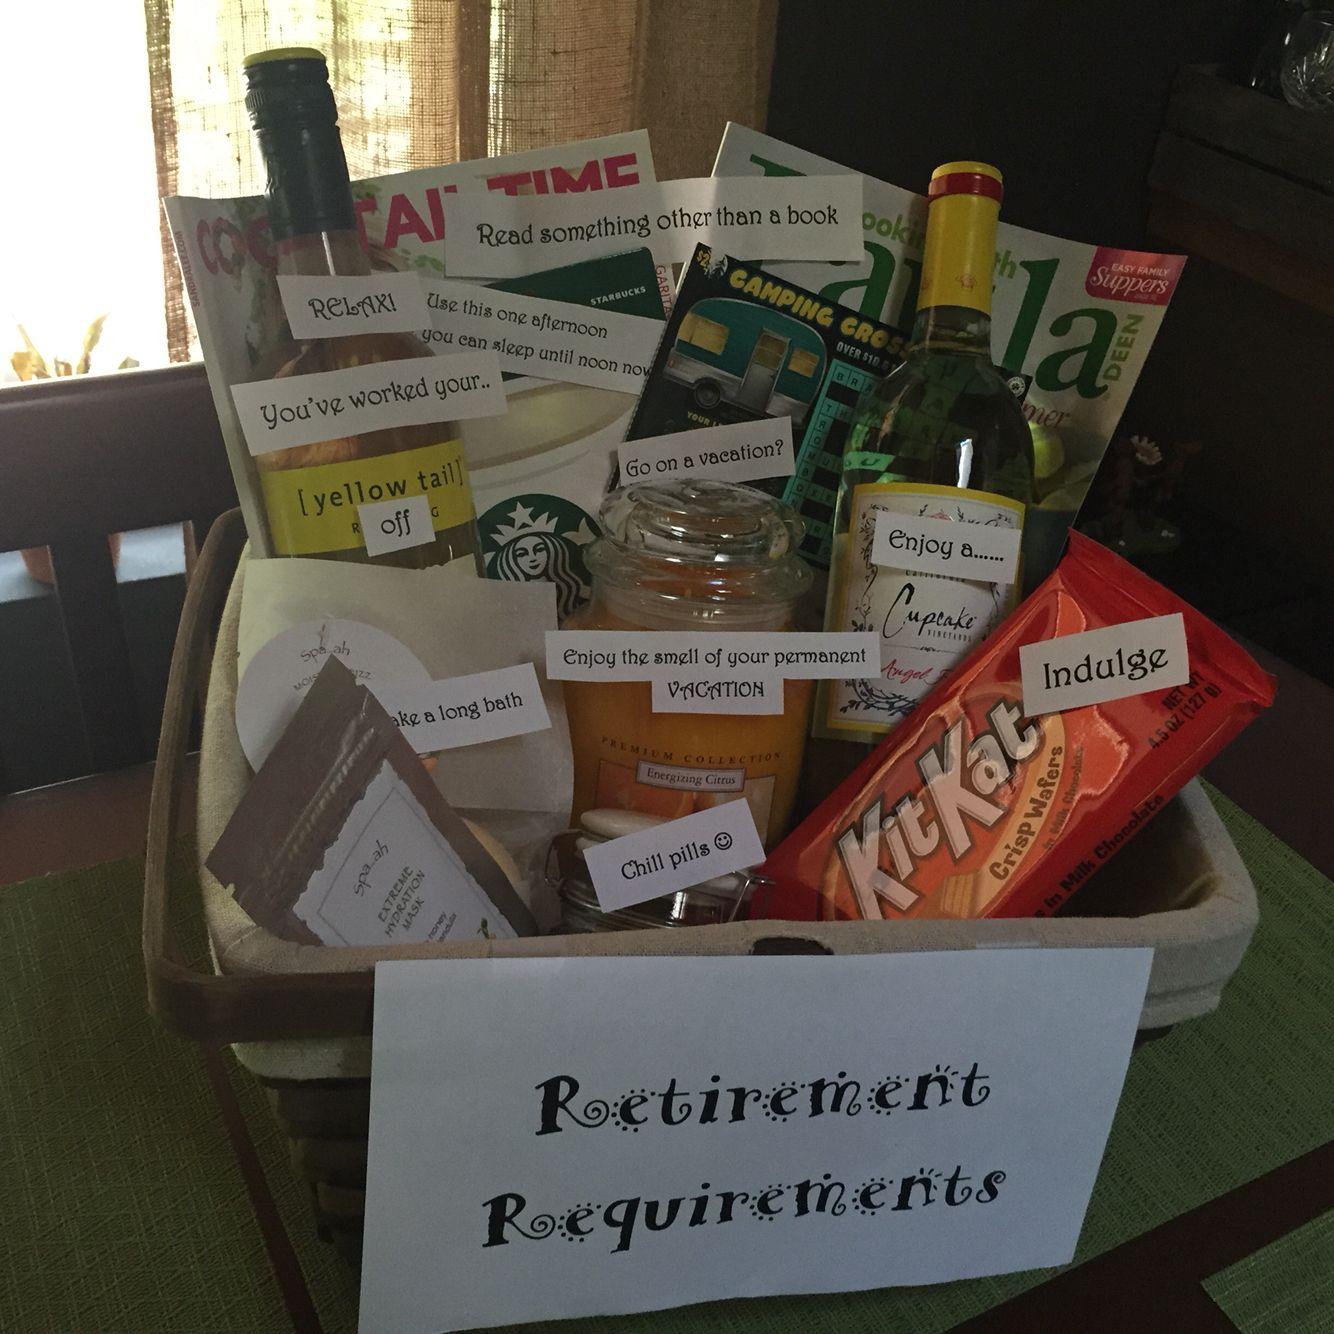 retirement requirements gift basket gift ideas pinterest